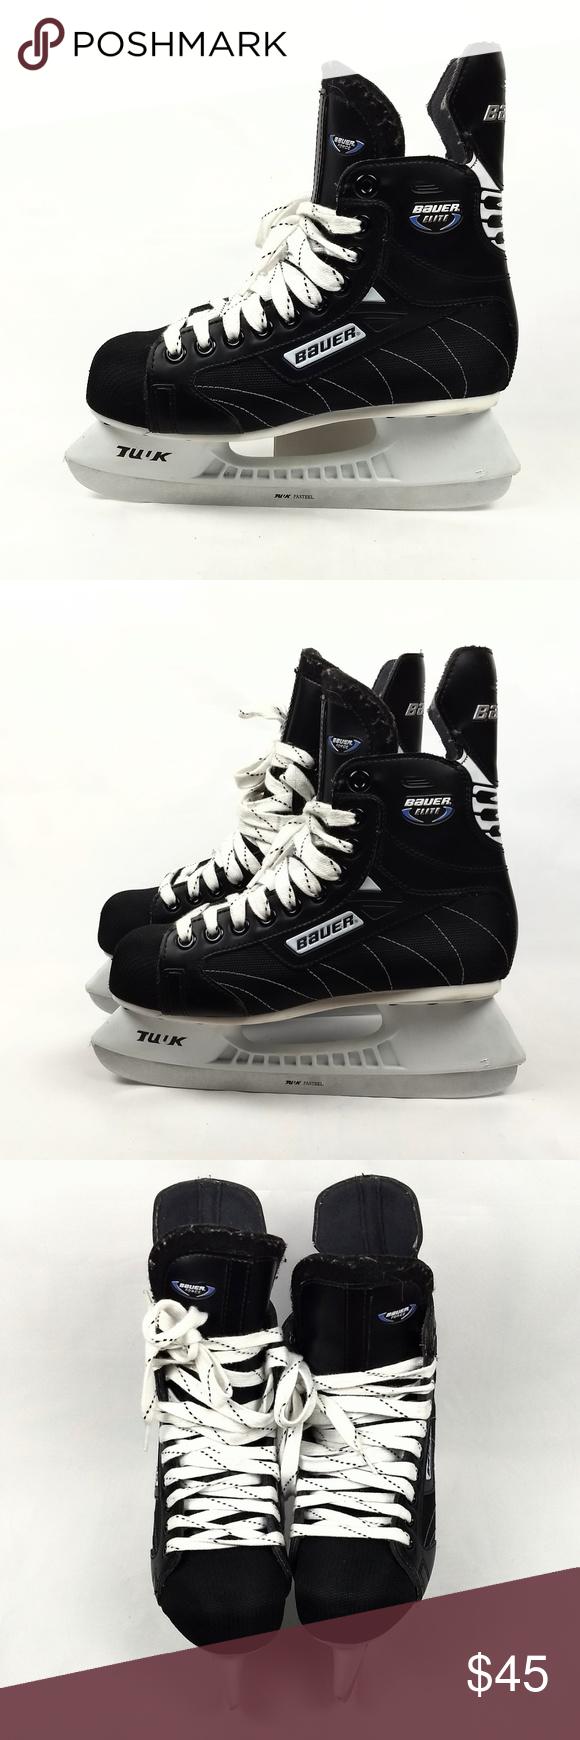 Bauer Skate Size To Shoe Size.Bauer Elite Ice Hockey Skate Mens Size 6 Eur 38 5 Bauer